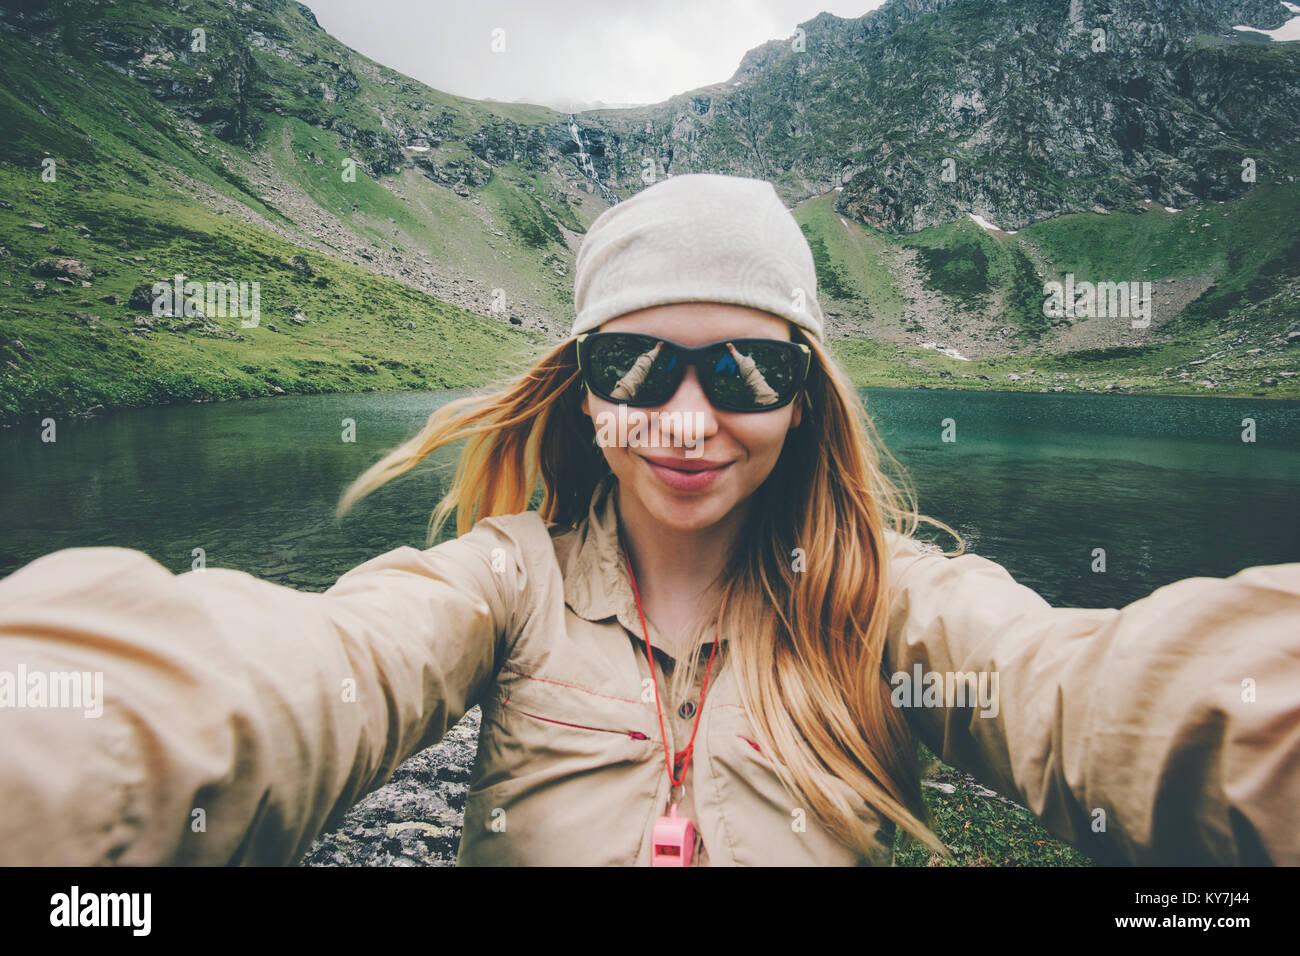 Woman traveler en tenant la randonnée en montagne selfies Vie Voyage adventure concept active summer vacations Photo Stock